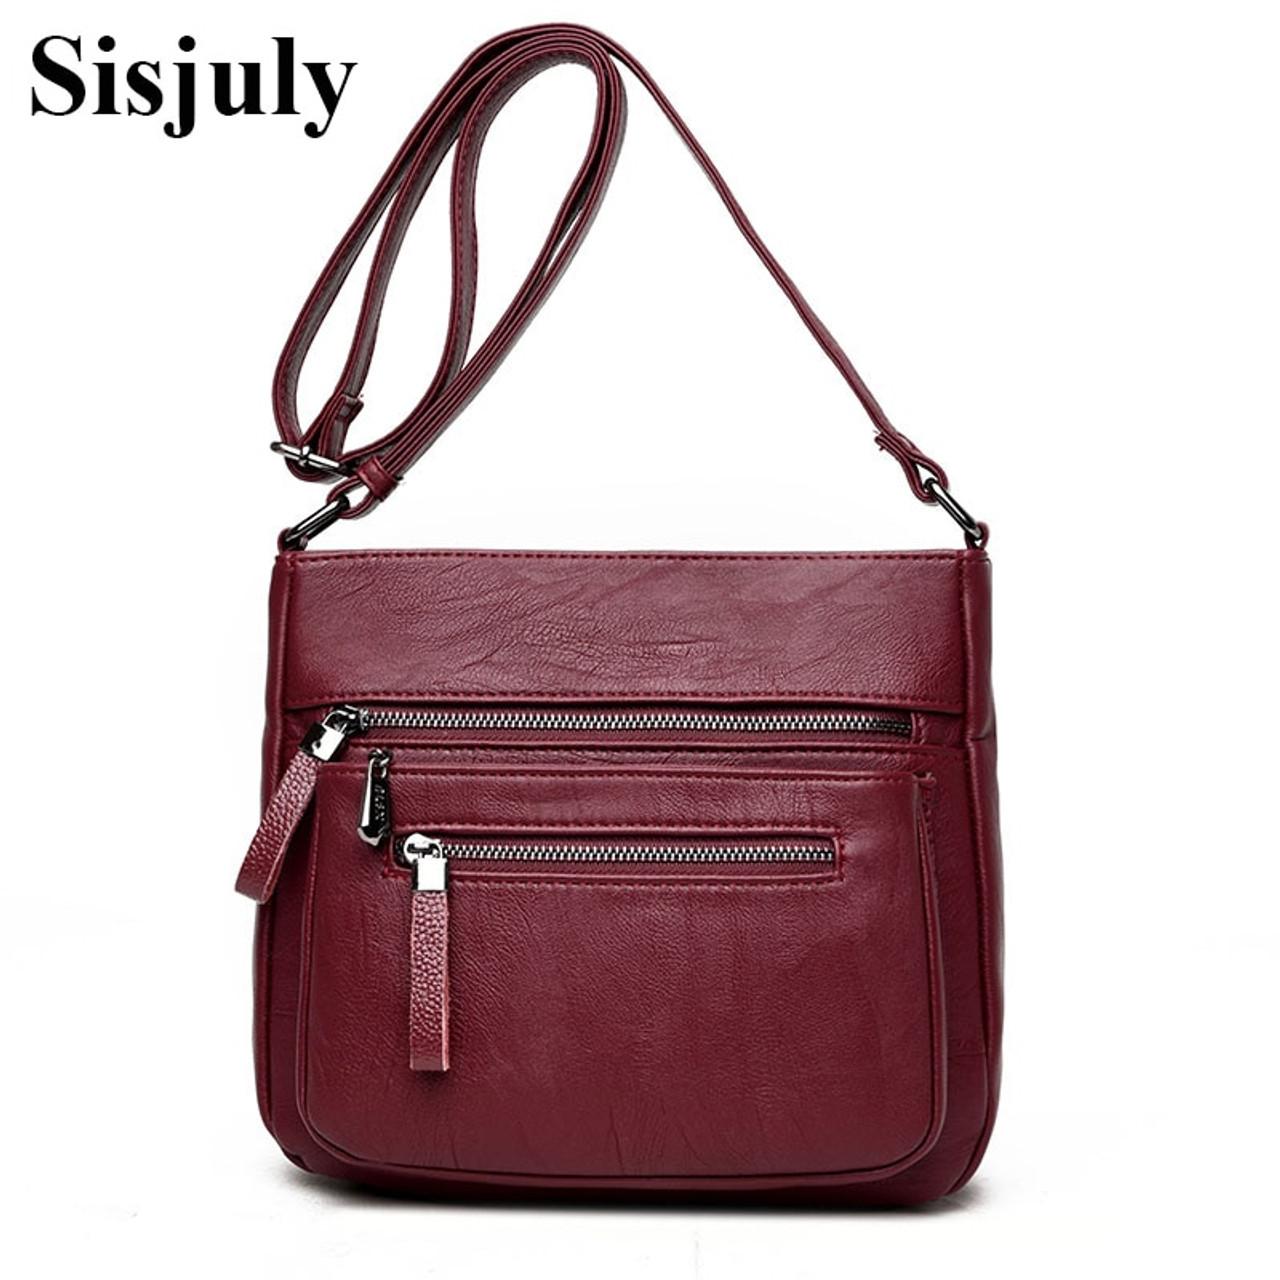 Luxury Bag Women Messenger Bags Female PU Leather Handbags Small Crossbody  Bag For Women s Shoulder Bags Famous Brand Designers - OnshopDeals.Com cdcb516efa669